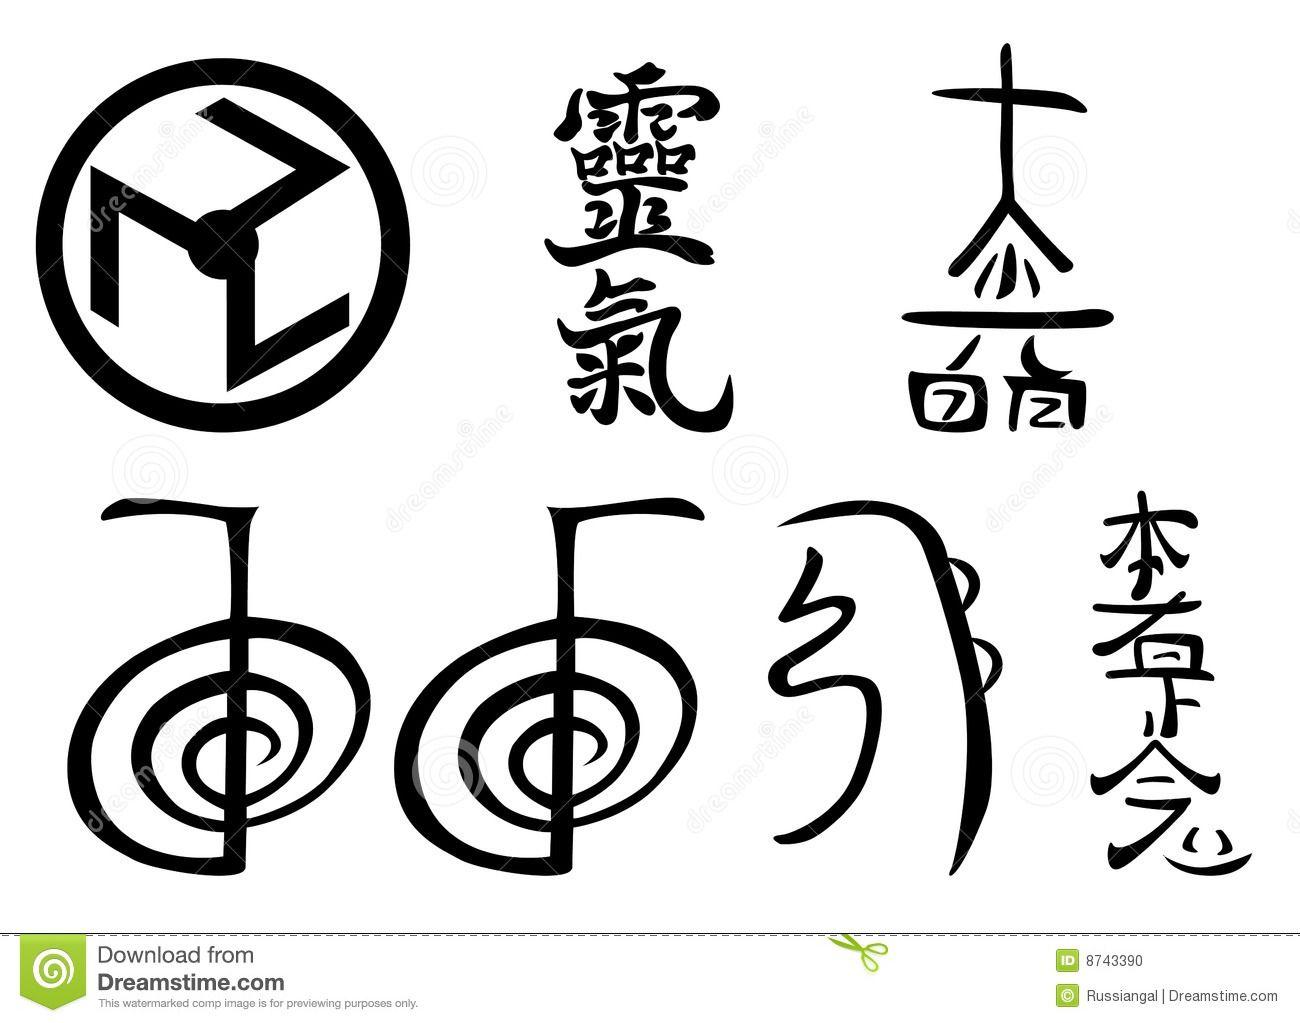 Pin by stacey mathews on reiki pinterest reiki symbols and chakras reiki symbols and meanings buycottarizona Choice Image